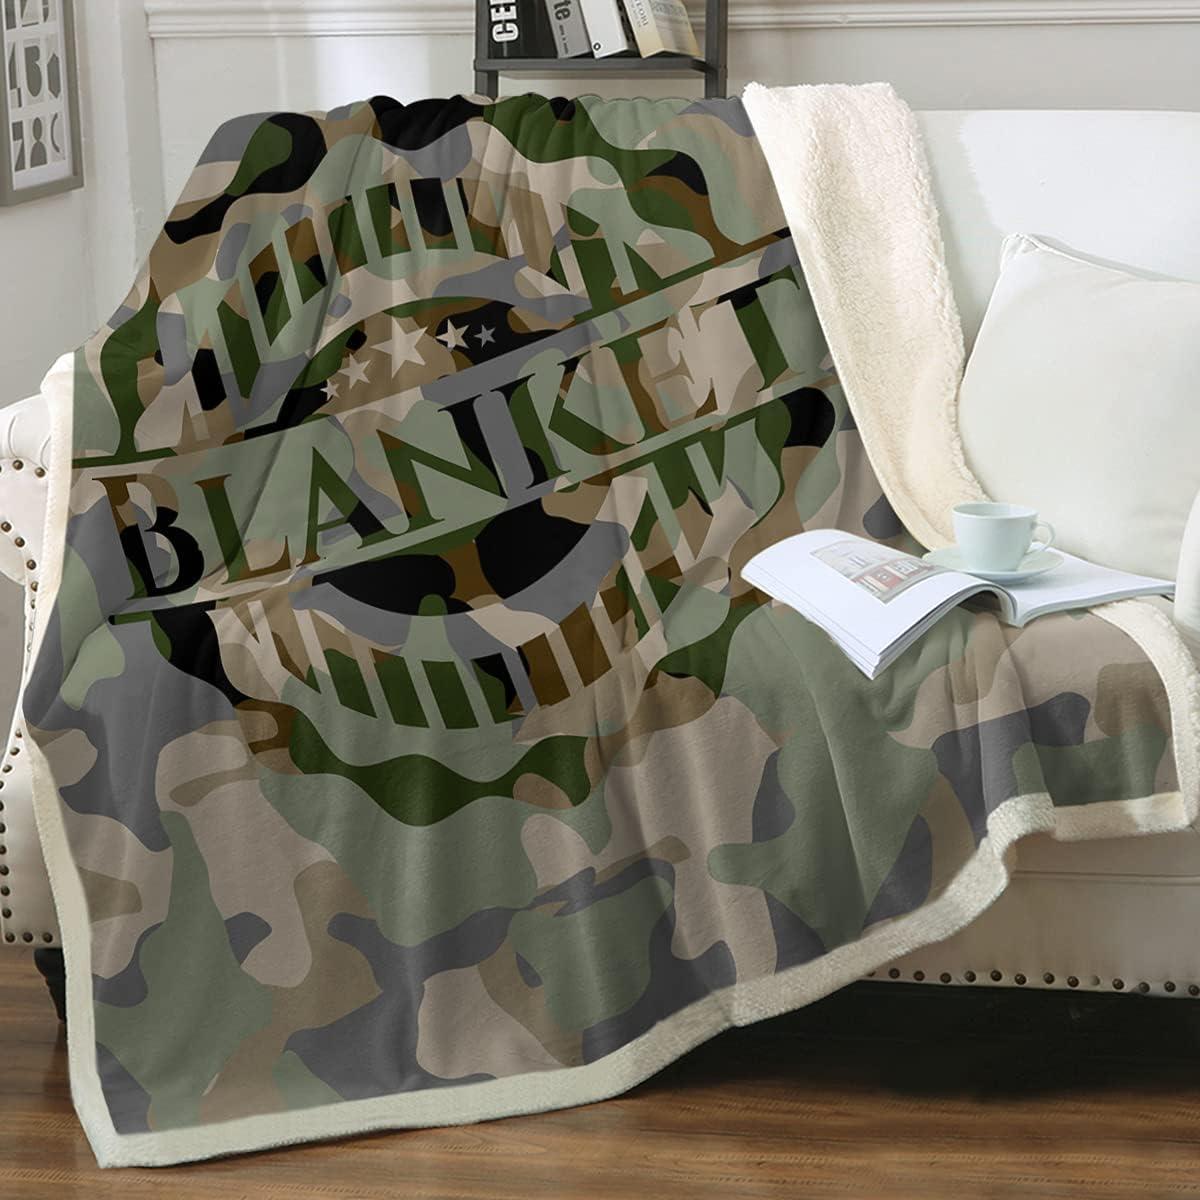 Sleepwish Camo Throw Brand new Ranking TOP16 Blanket King Boys Camouflage 108